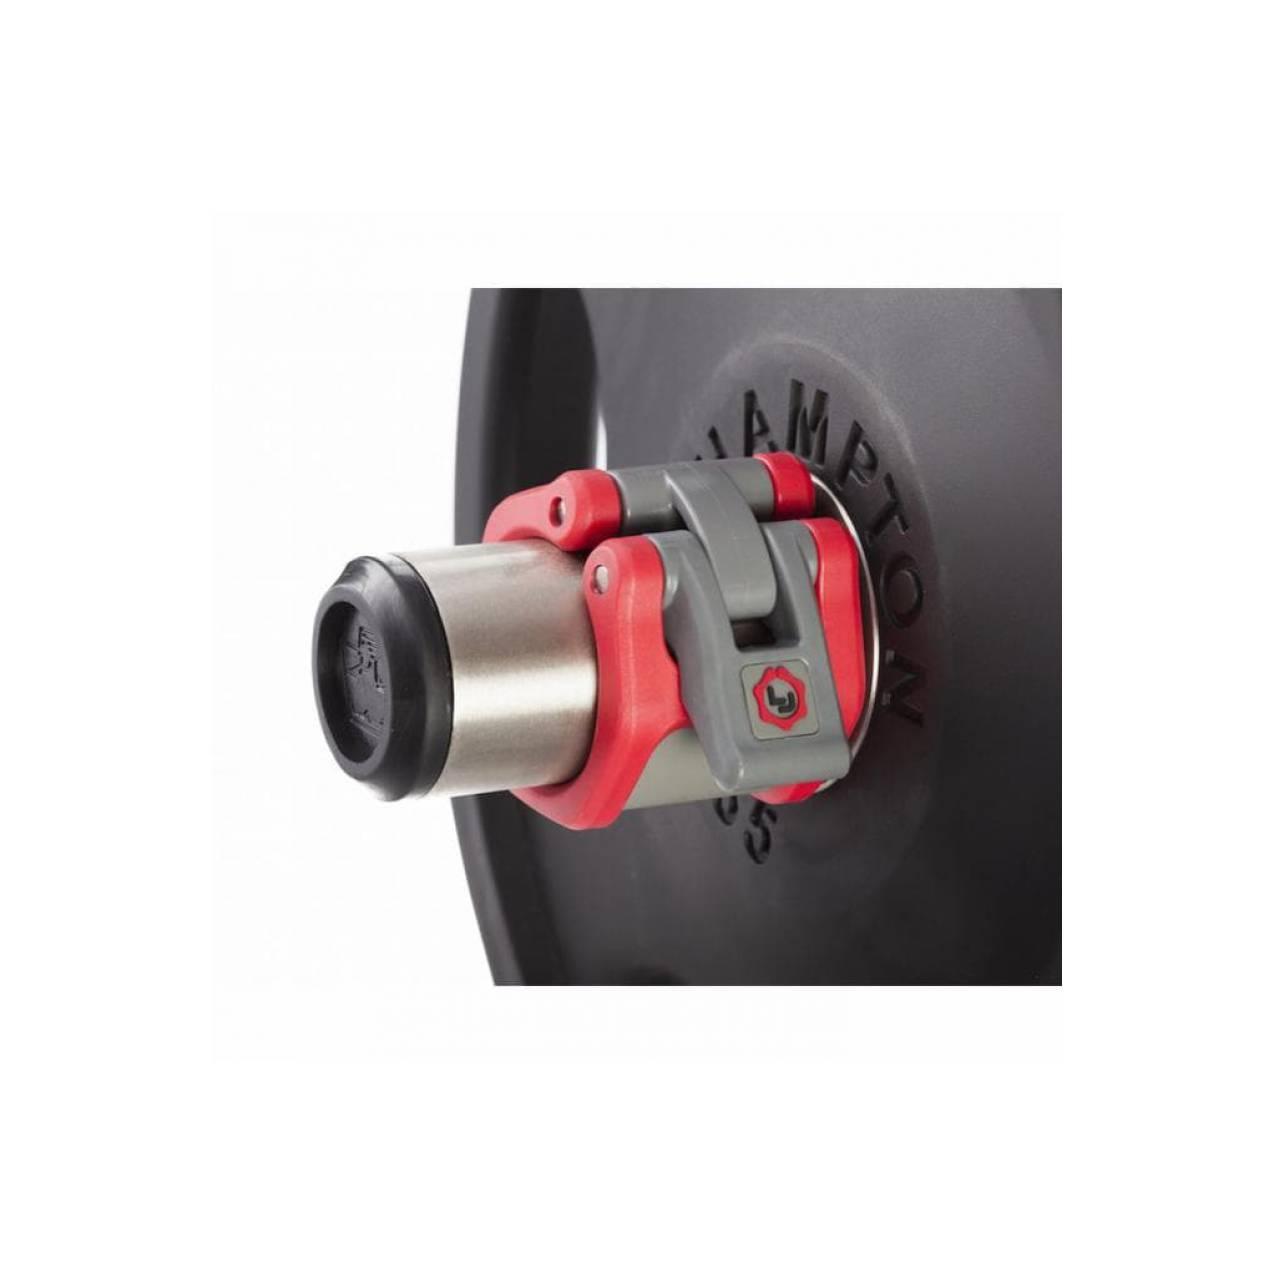 Jual Olympic Bar Lock | Collars | Kunci Pengunci Tiang Barbell Limited